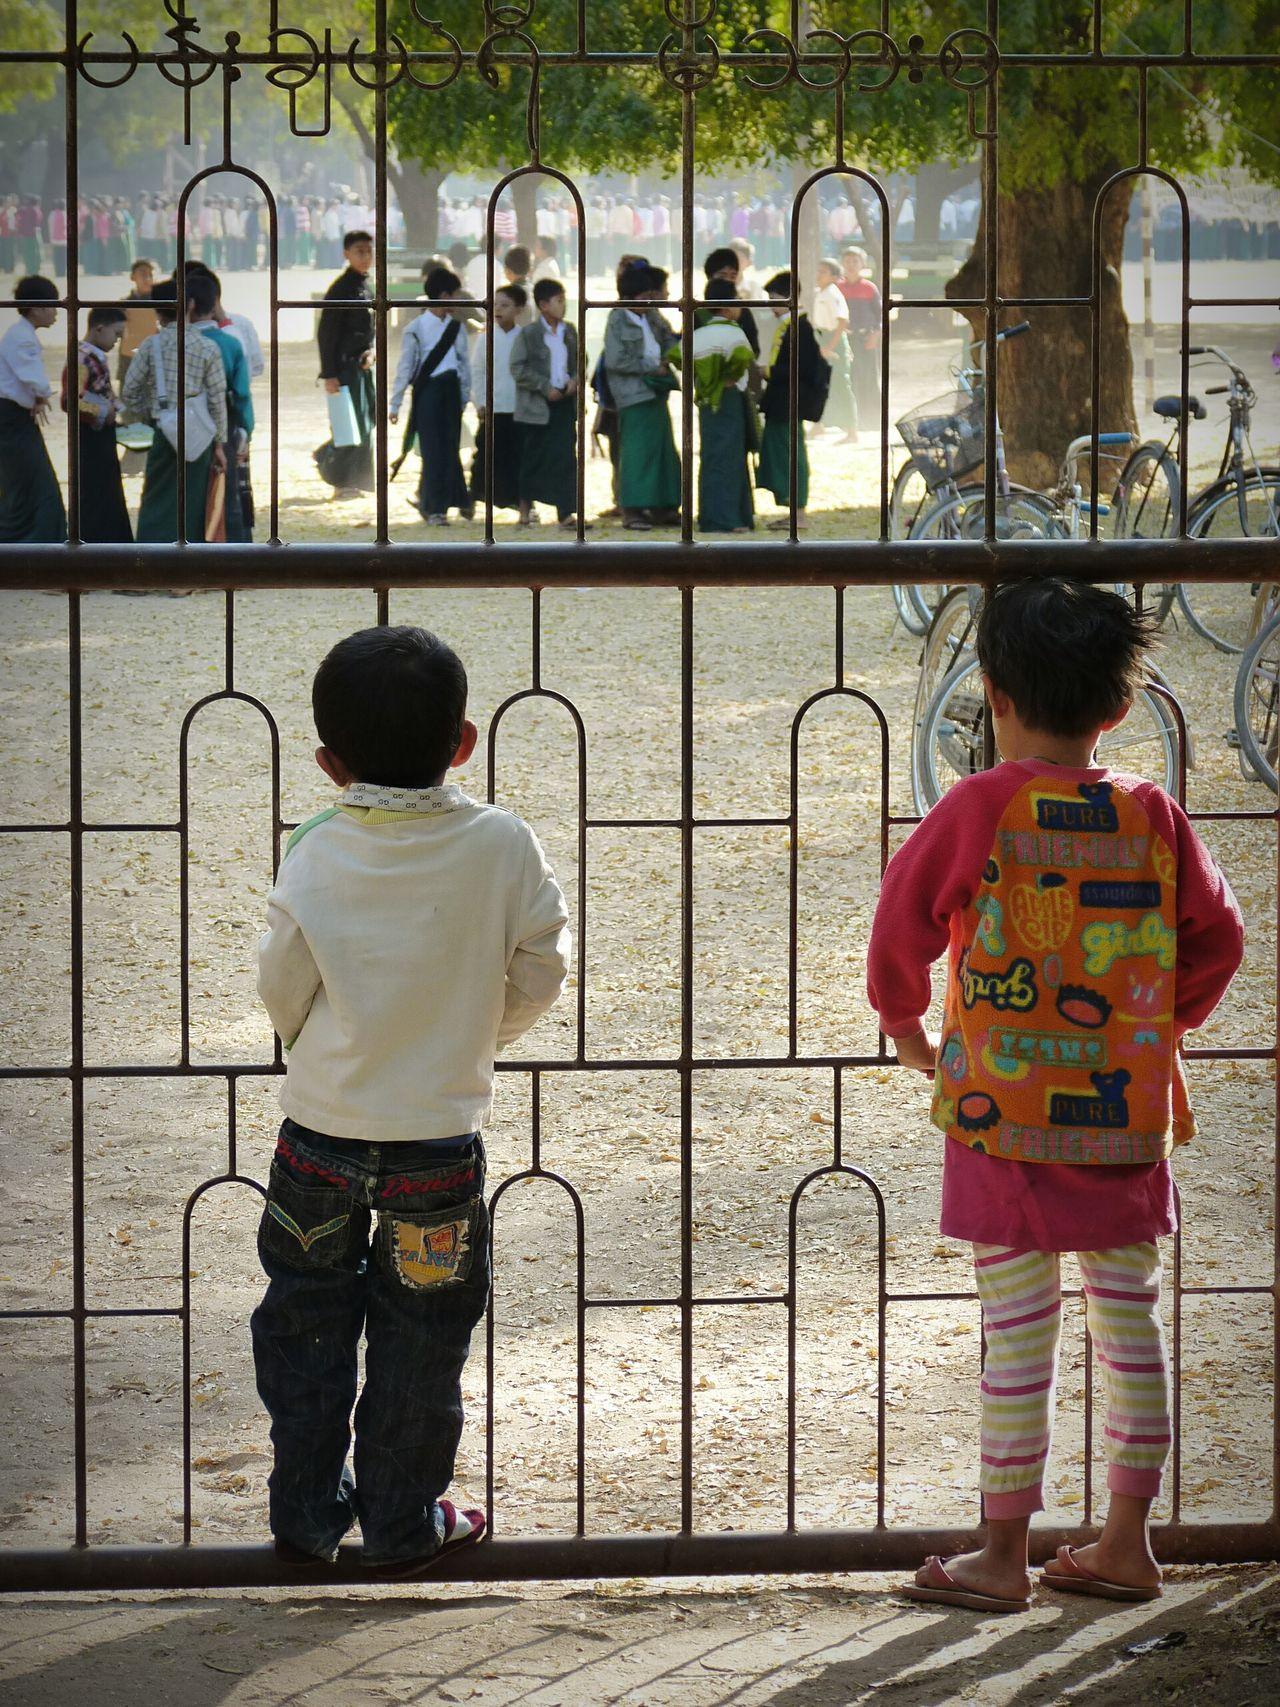 The Color Of School School Education School Day School Life  Beautiful Myanmar Myanmarphotos Myanmar Burma People In And Out Fence Fence